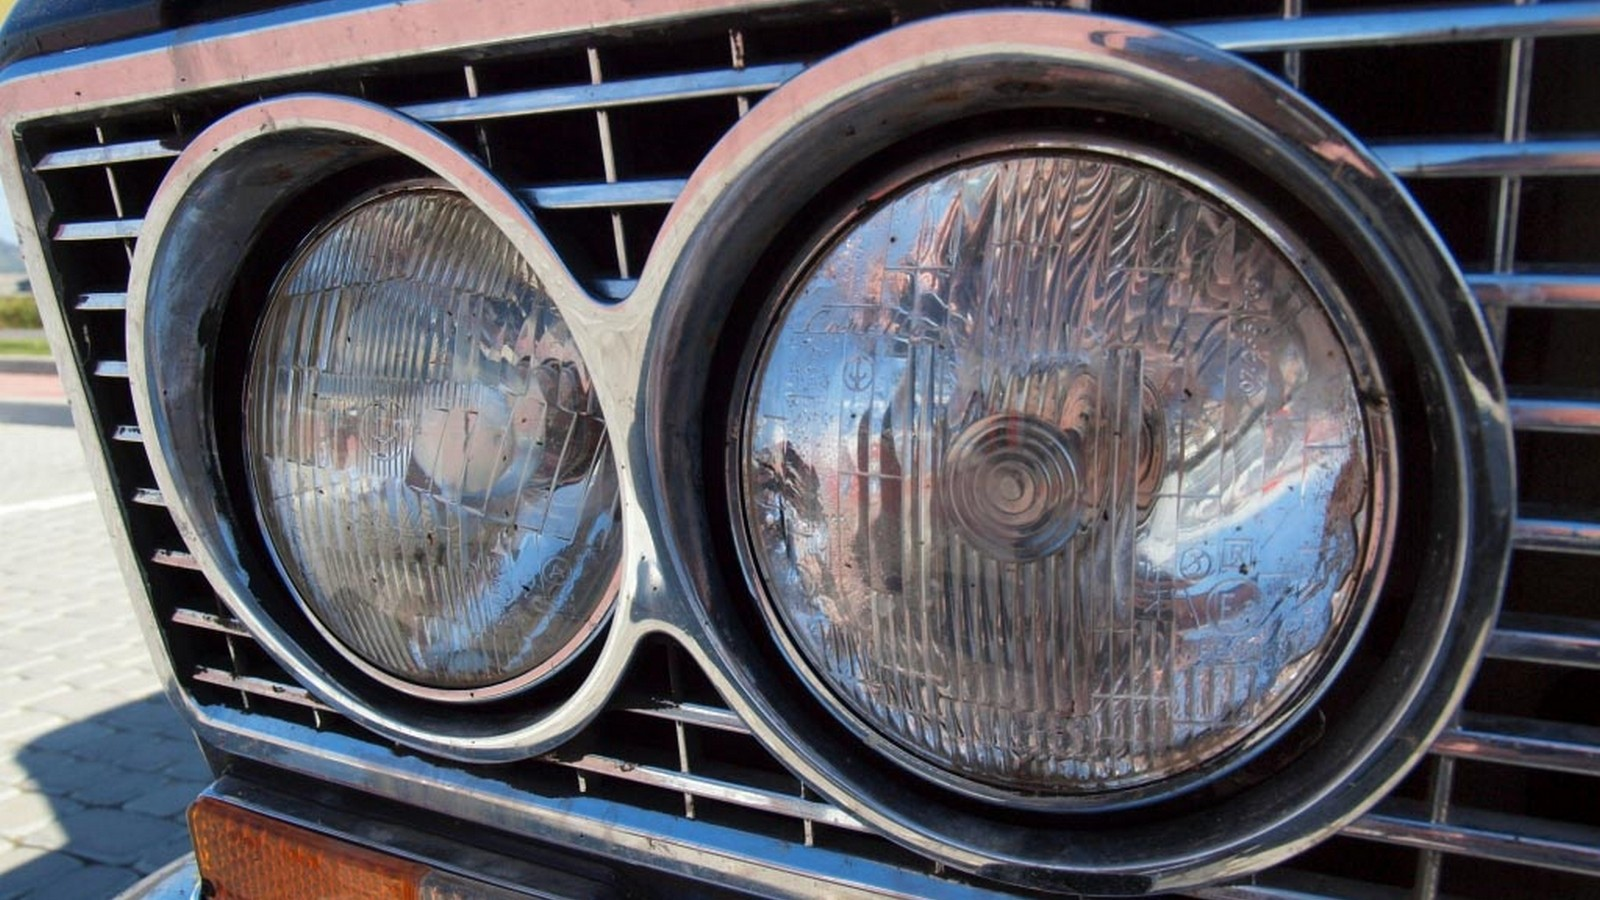 Фары Carello на ВАЗ-2103 1973 года